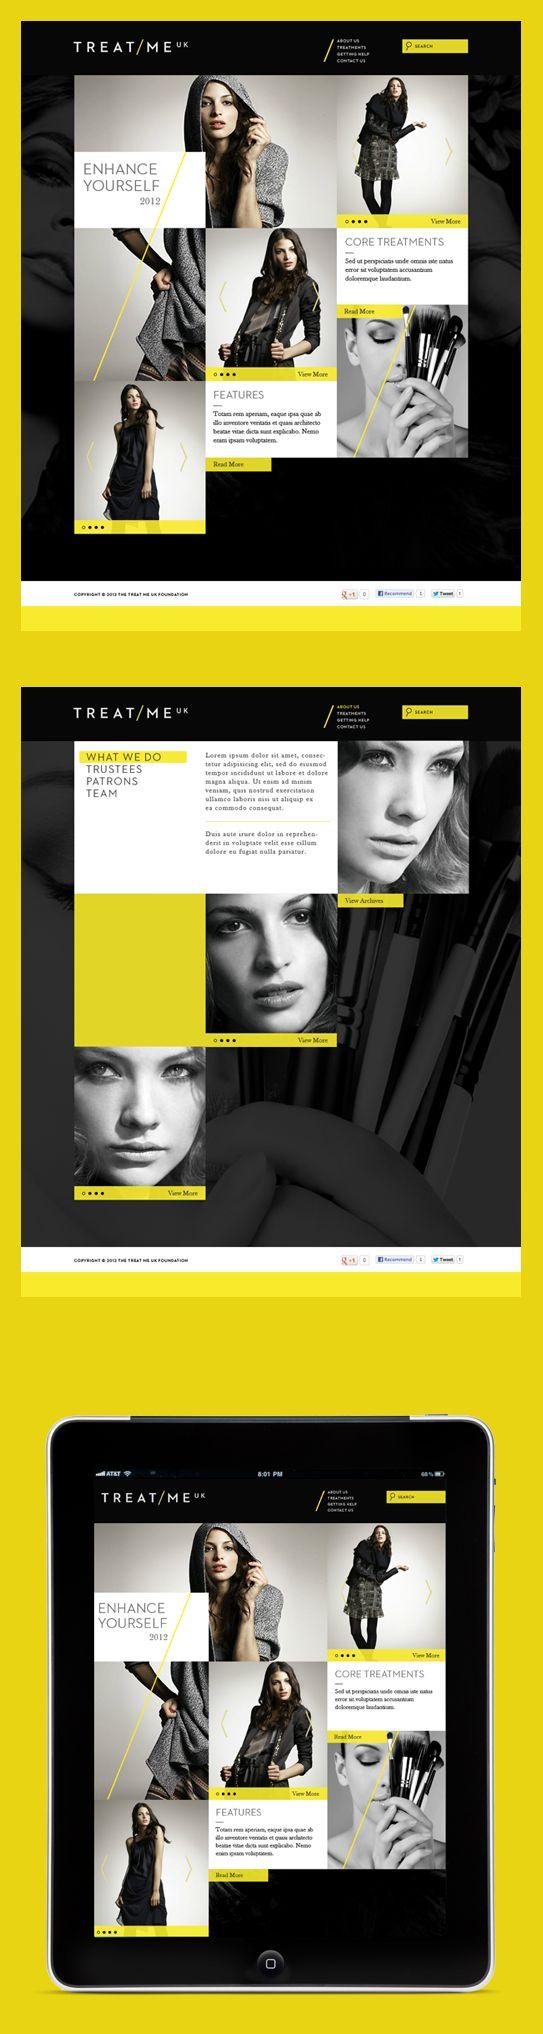 #Création #Conception #Site #web, #Template #Responsive #Parallax #Wordpress, #joomla, #Magento, #Prestashop